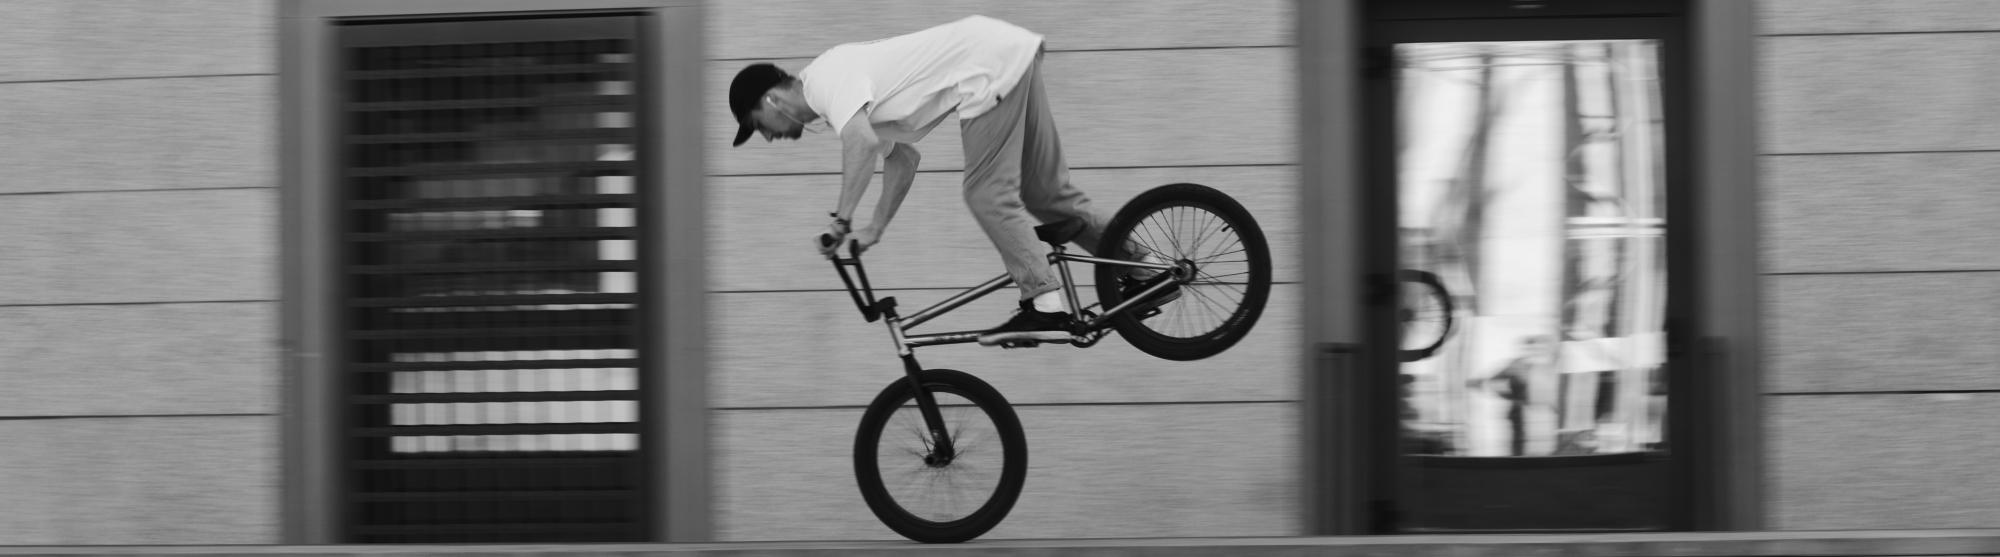 Street/Park Bikes